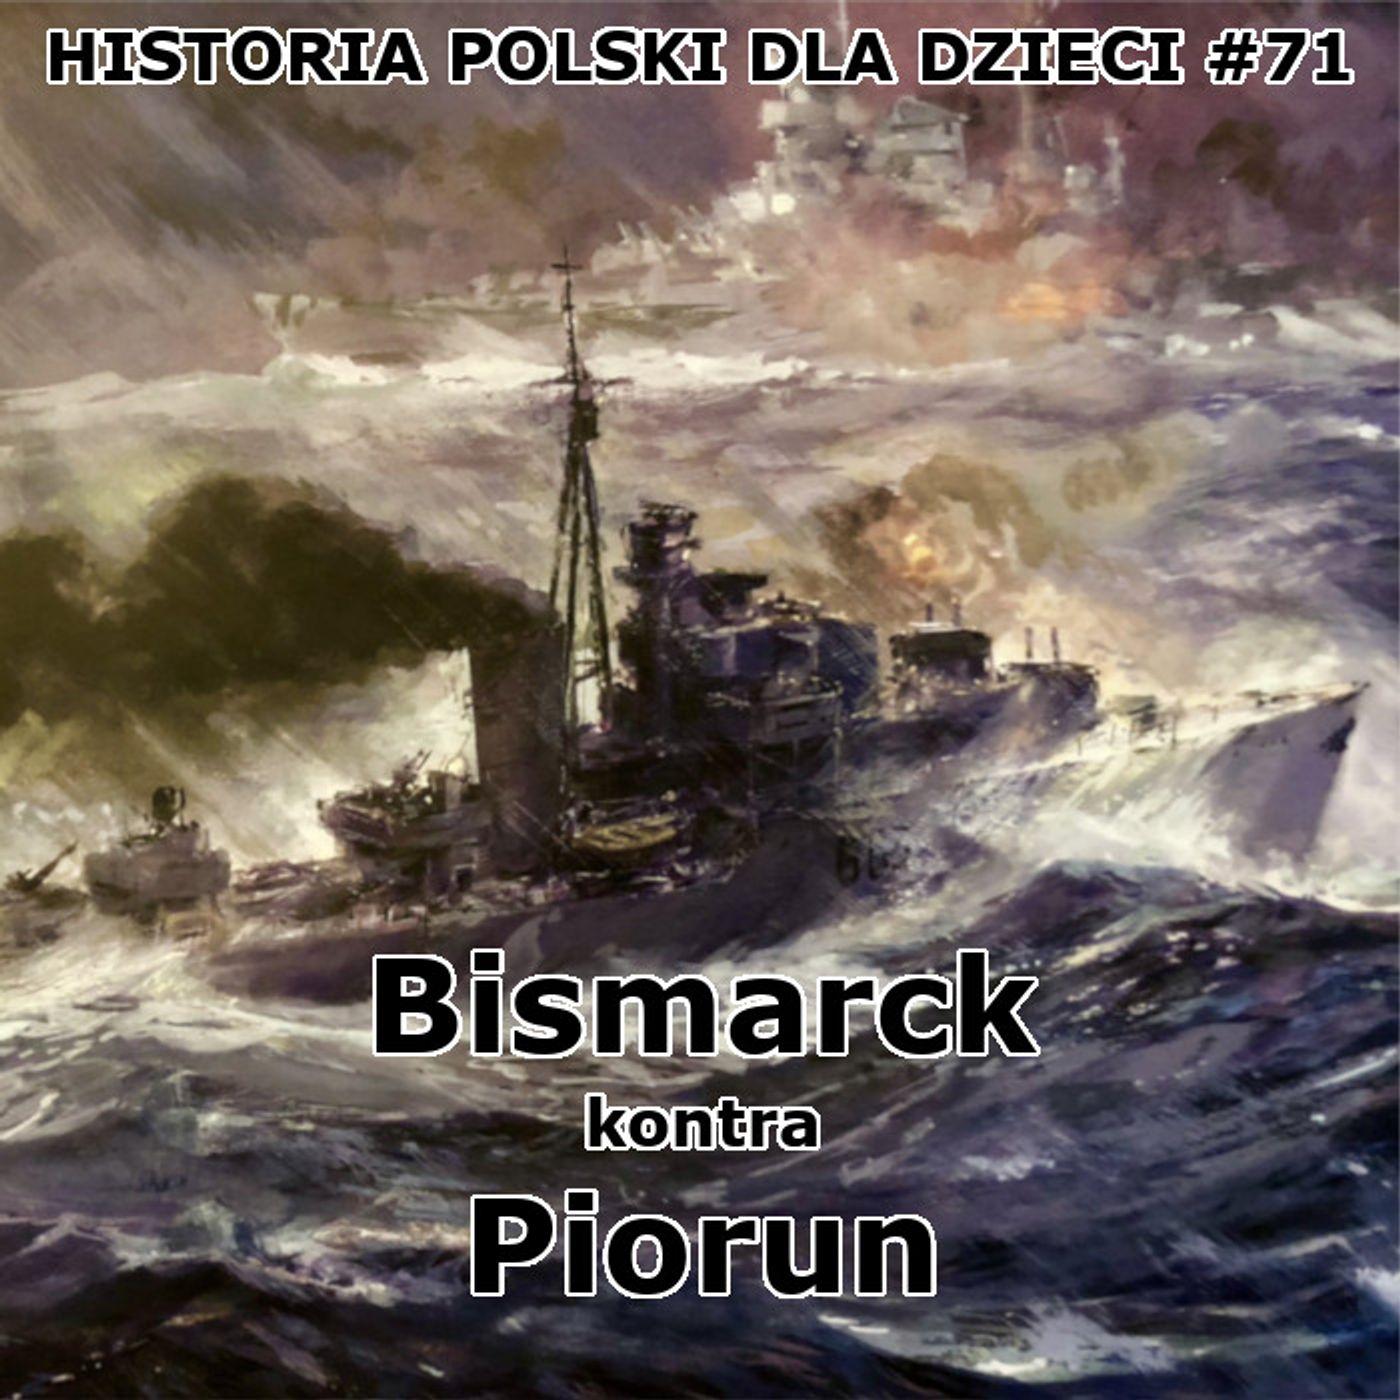 71 - Bismarck kontra Piorun